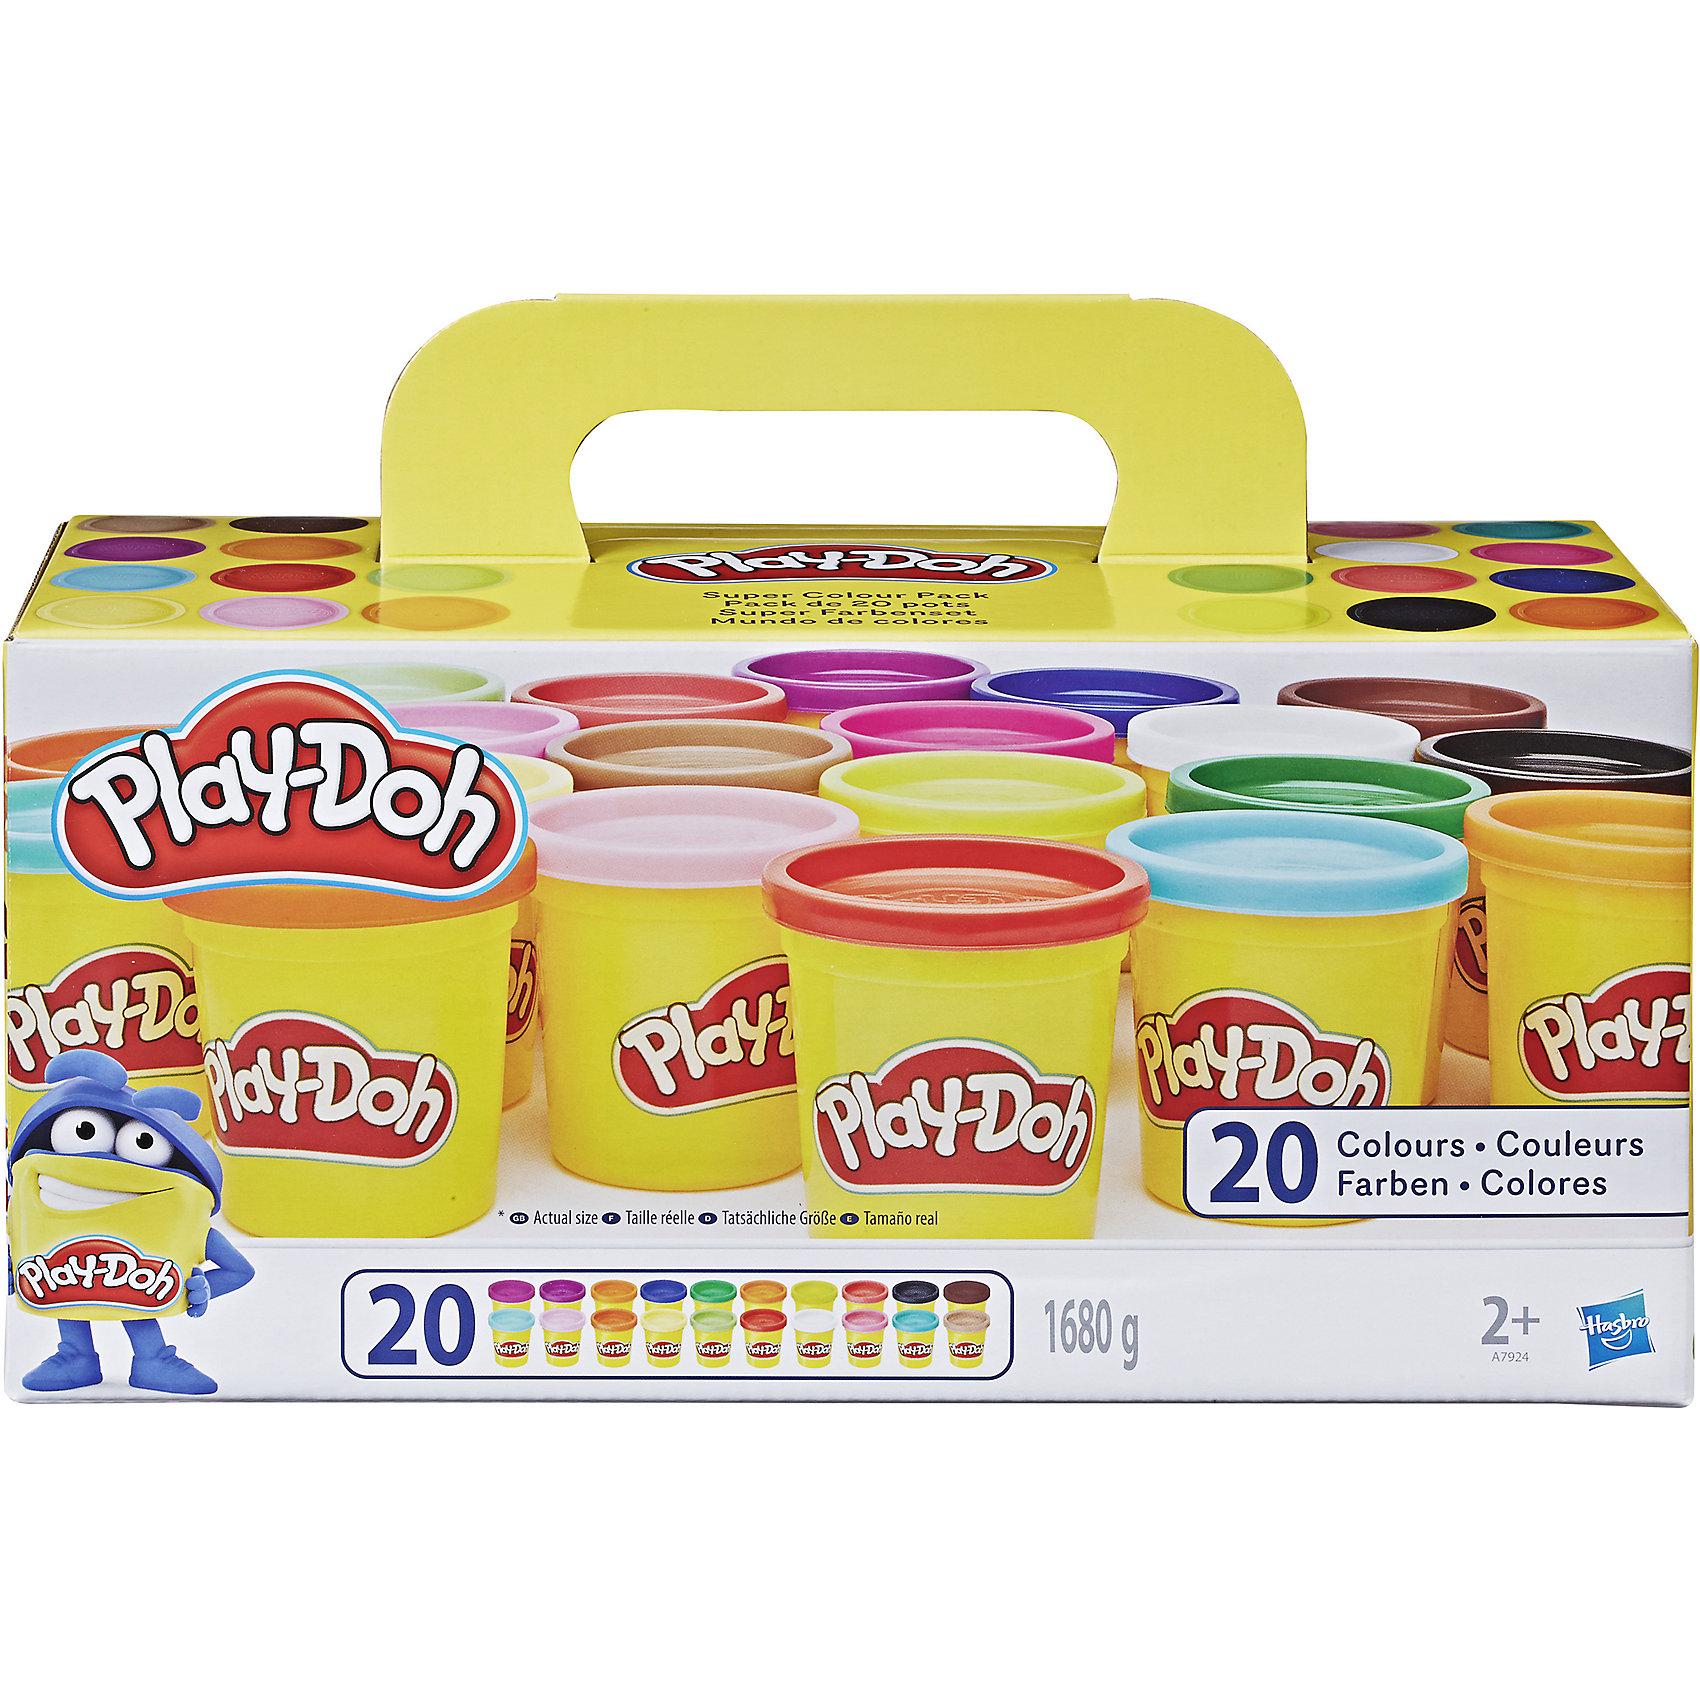 Hasbro Набор пластилина из 20 баночек, Play-Doh hasbro play doh a7924 игровой набор пластилина из 20 баночек